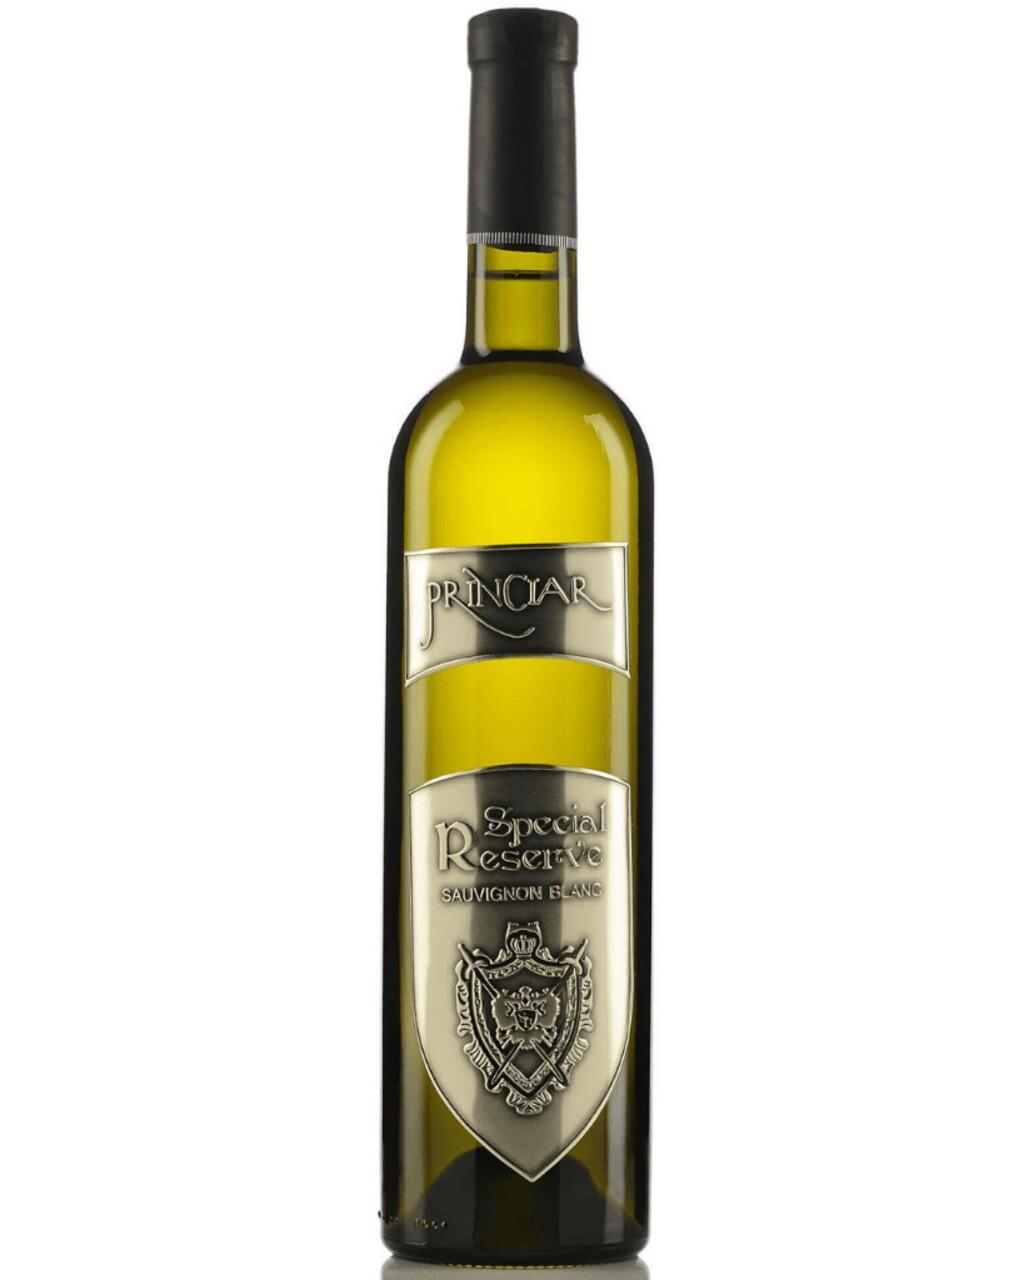 Tohani Princiar Special Reserve Sauvignon Blanc